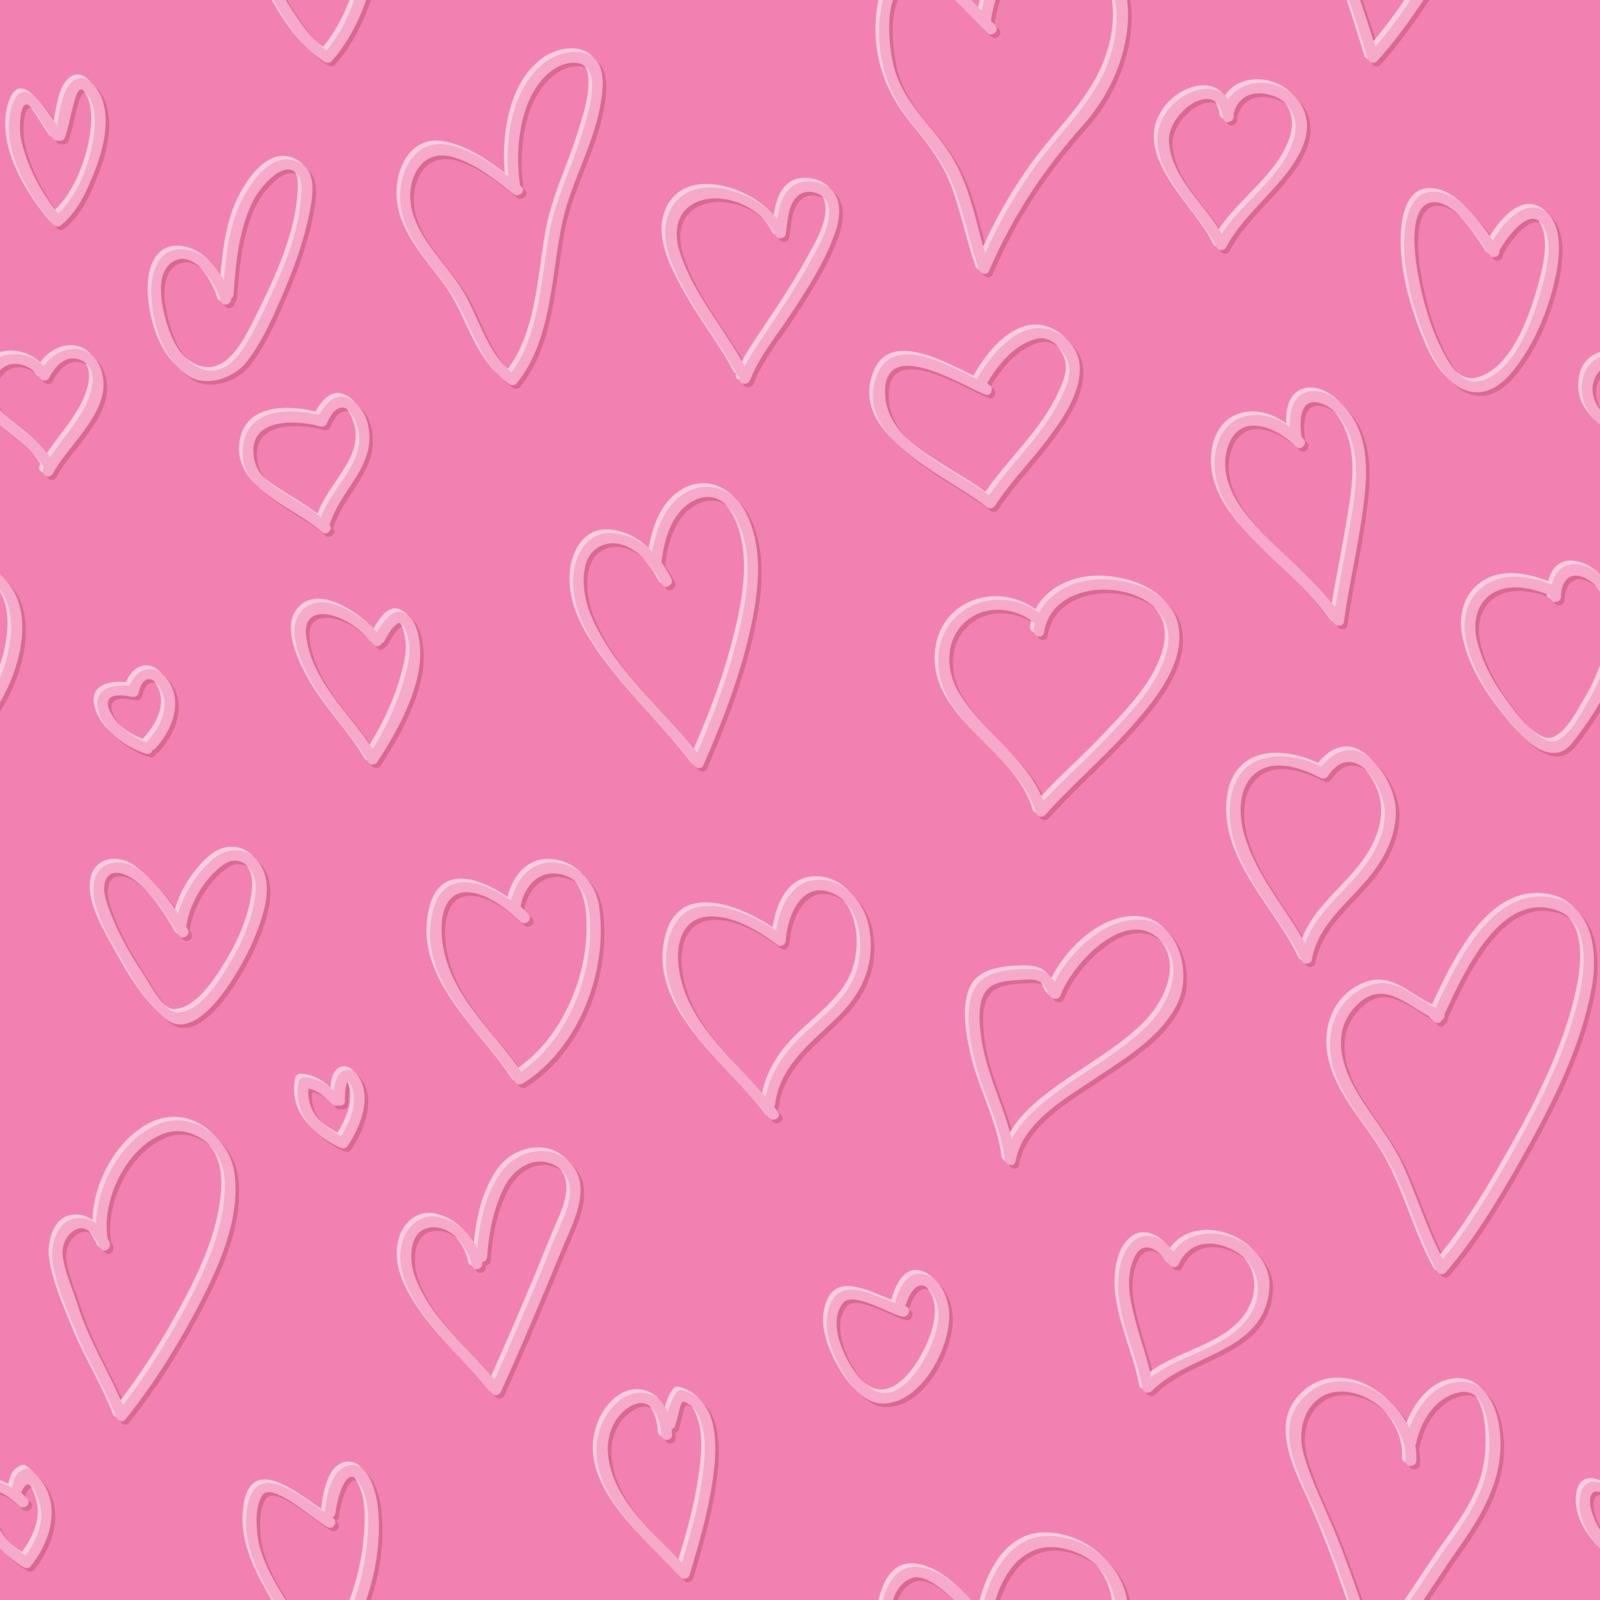 Sketch heart in vintage style, seamless pattern